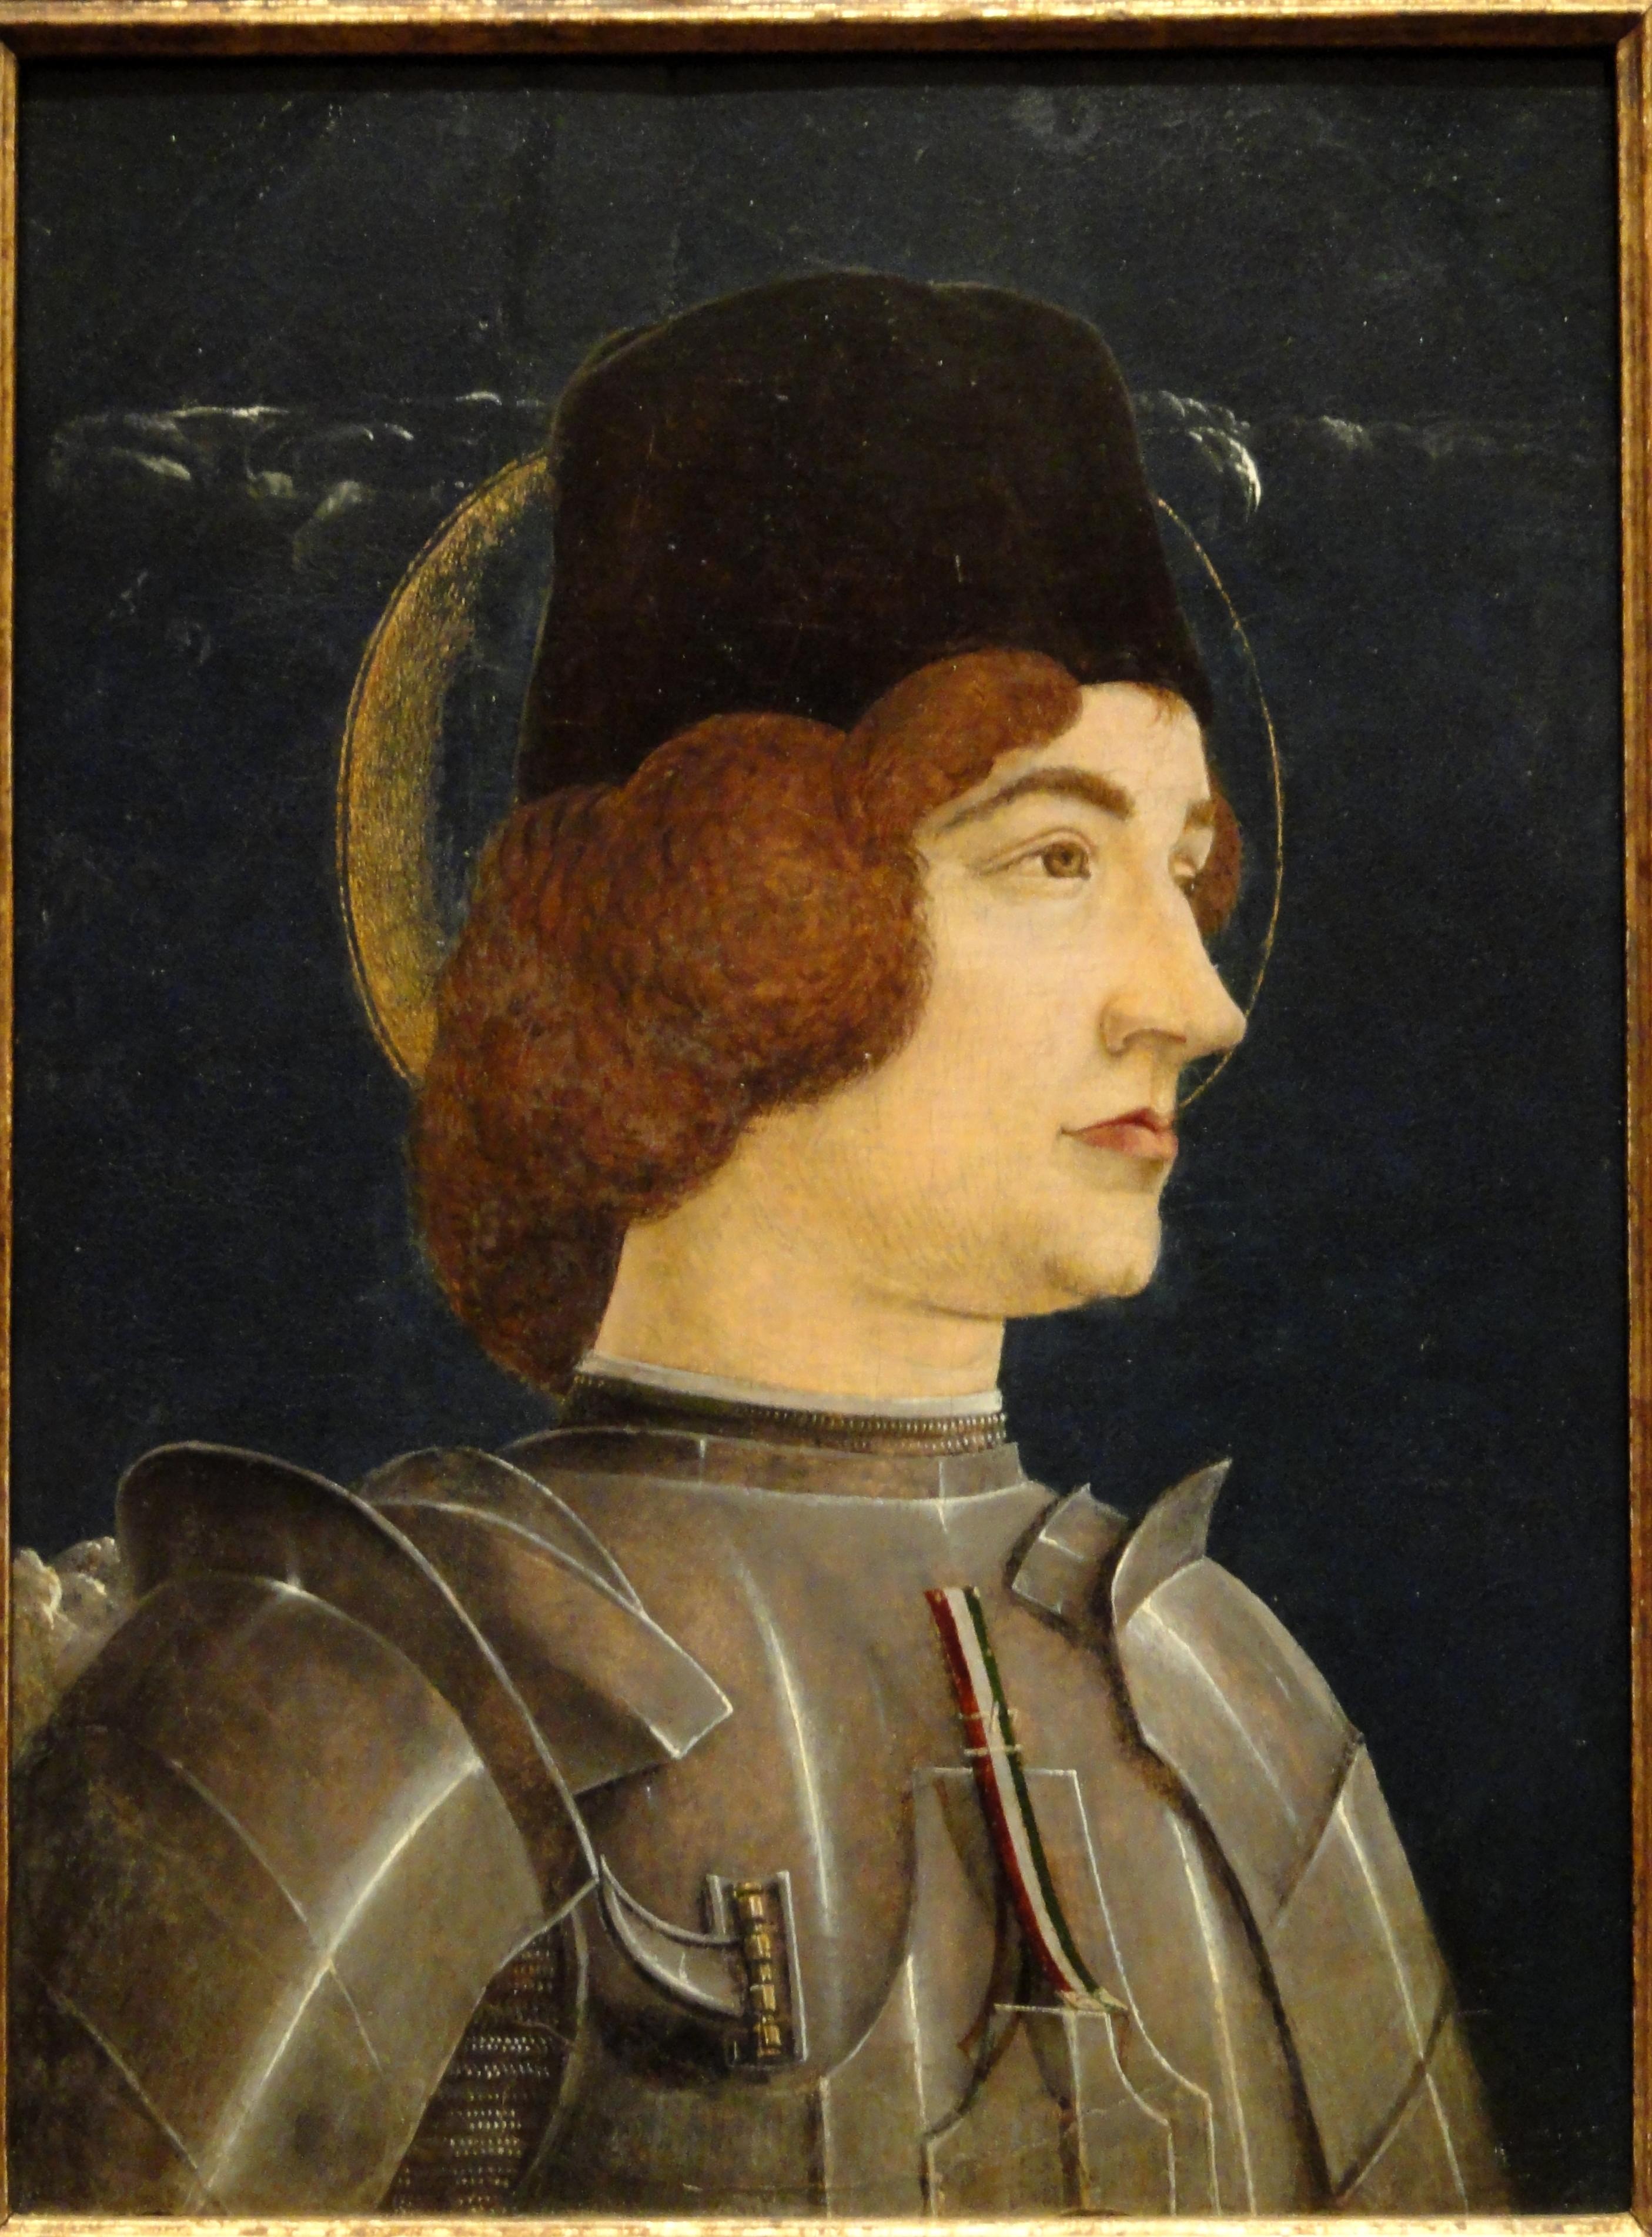 File:Saint George by Cosme Tura, Ferrara, c. 1475-1476,